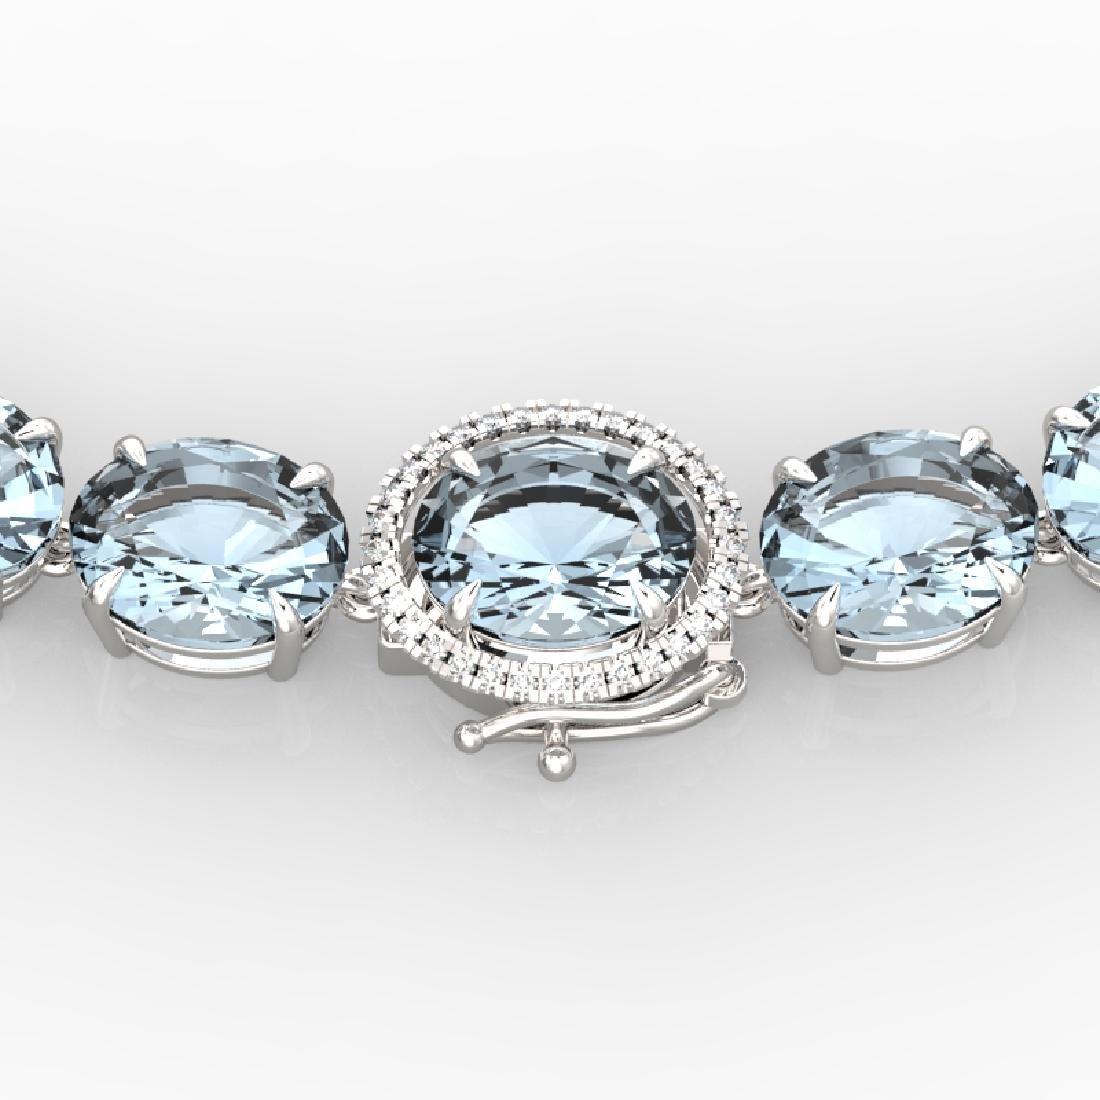 136 CTW Aquamarine & VS/SI Diamond Necklace 14K White